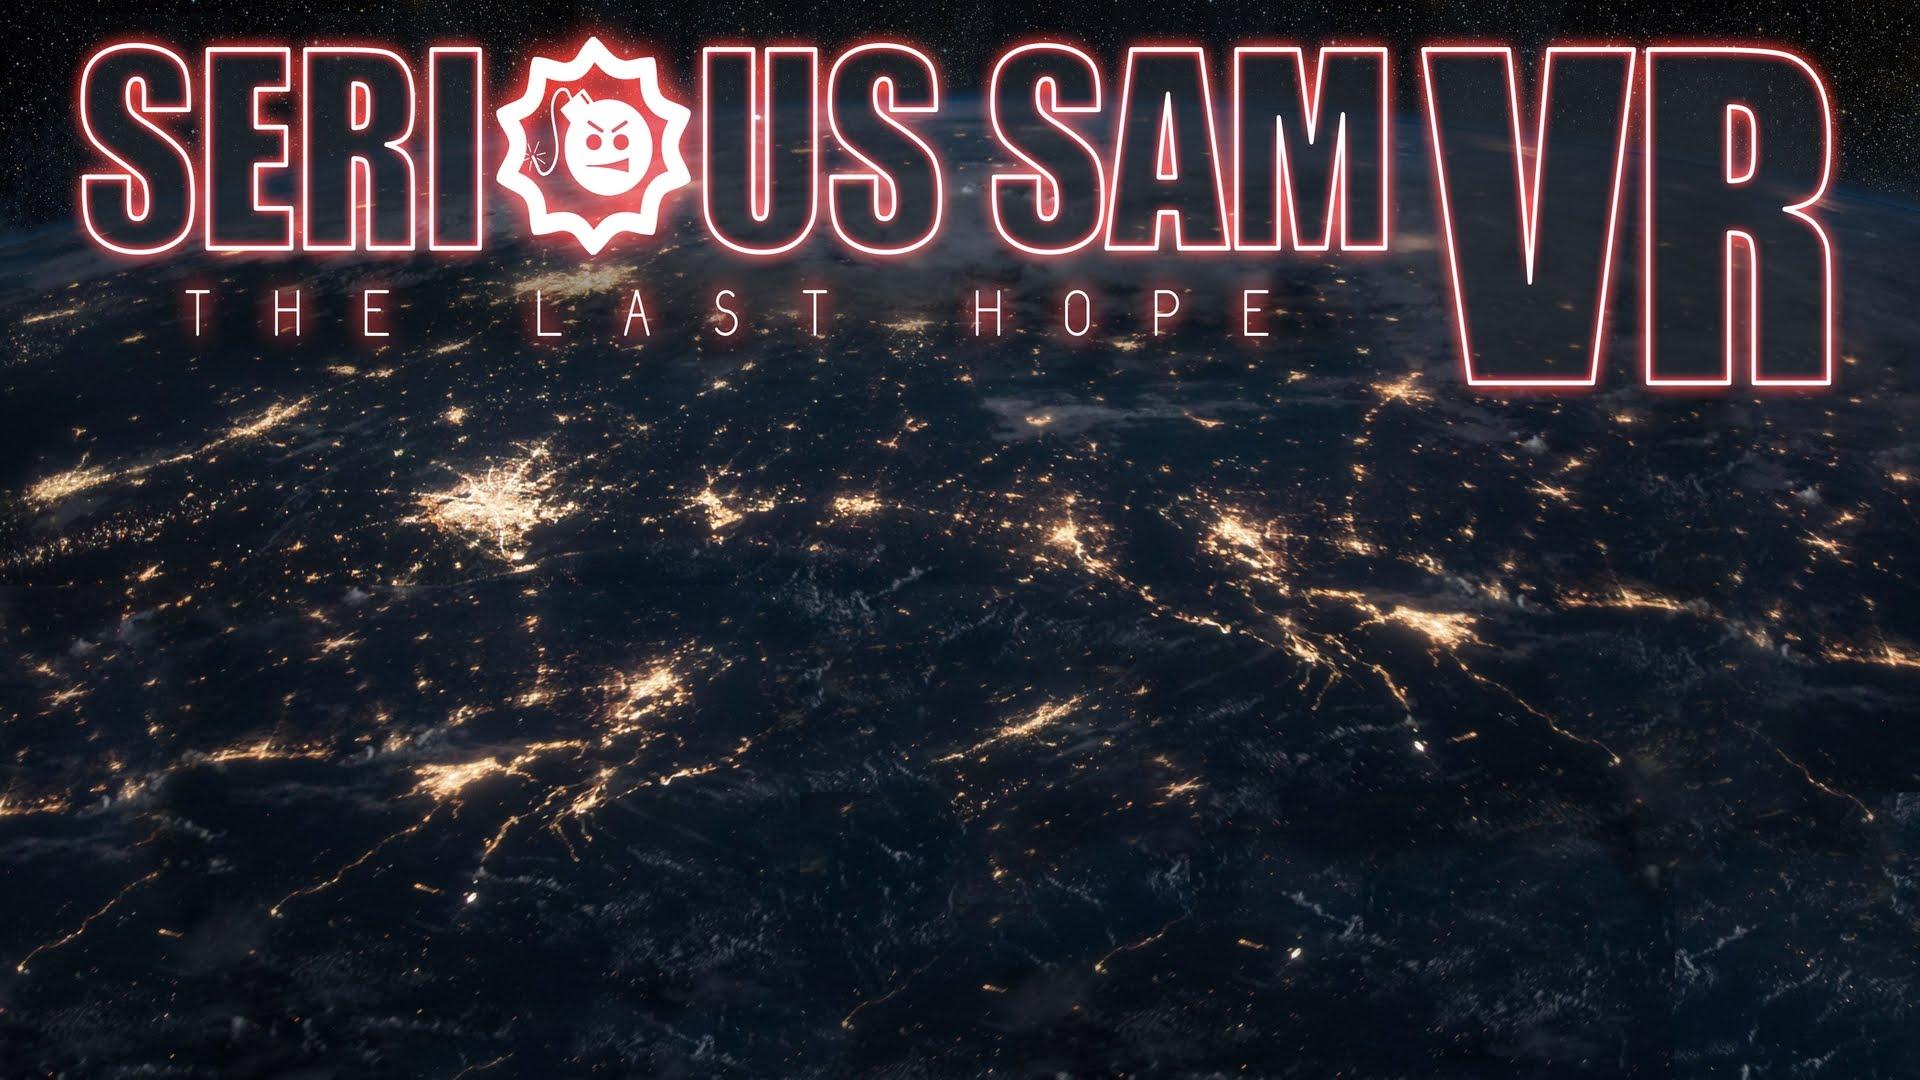 Serious Sam se apunta a la realidad virtual en HTC Vive y Oculus Rift